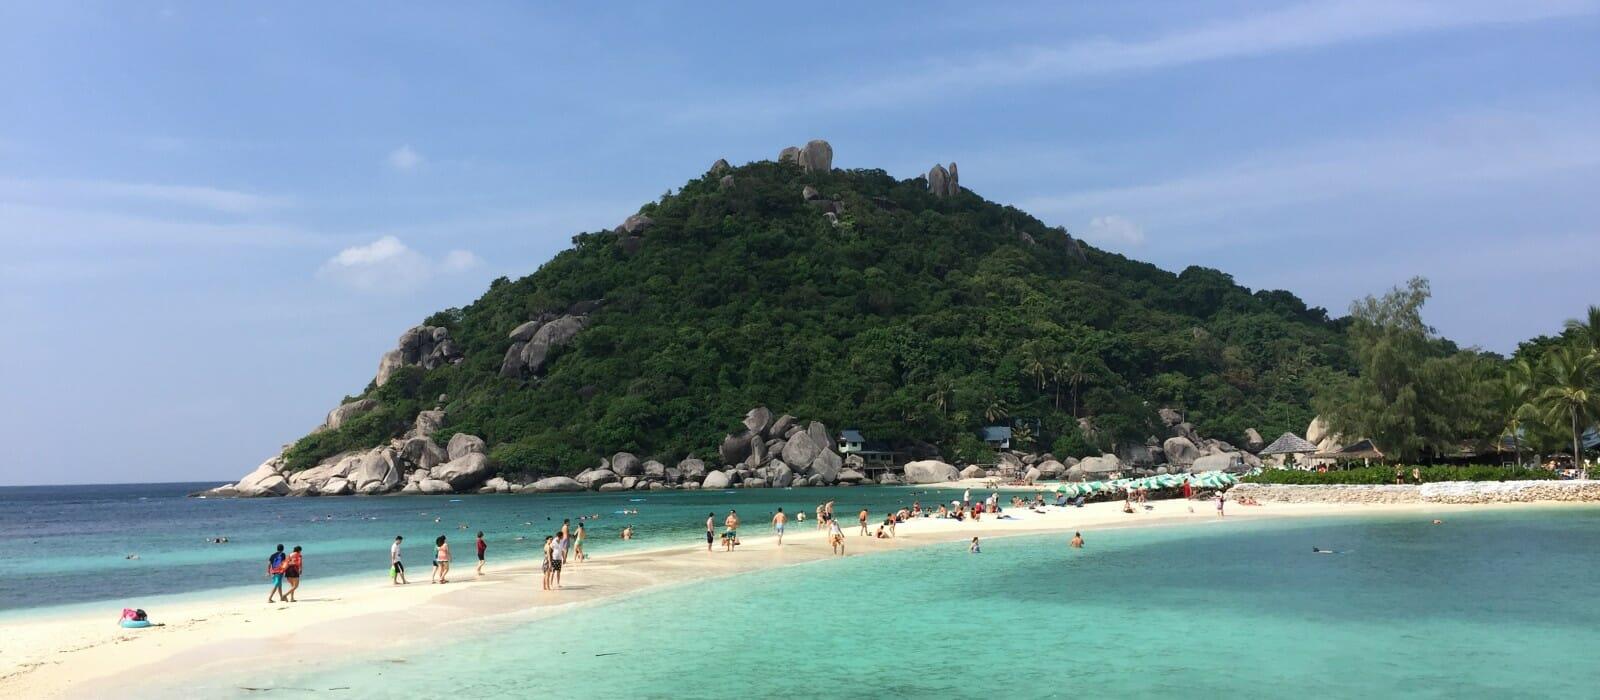 Koh Tao Travel Guide